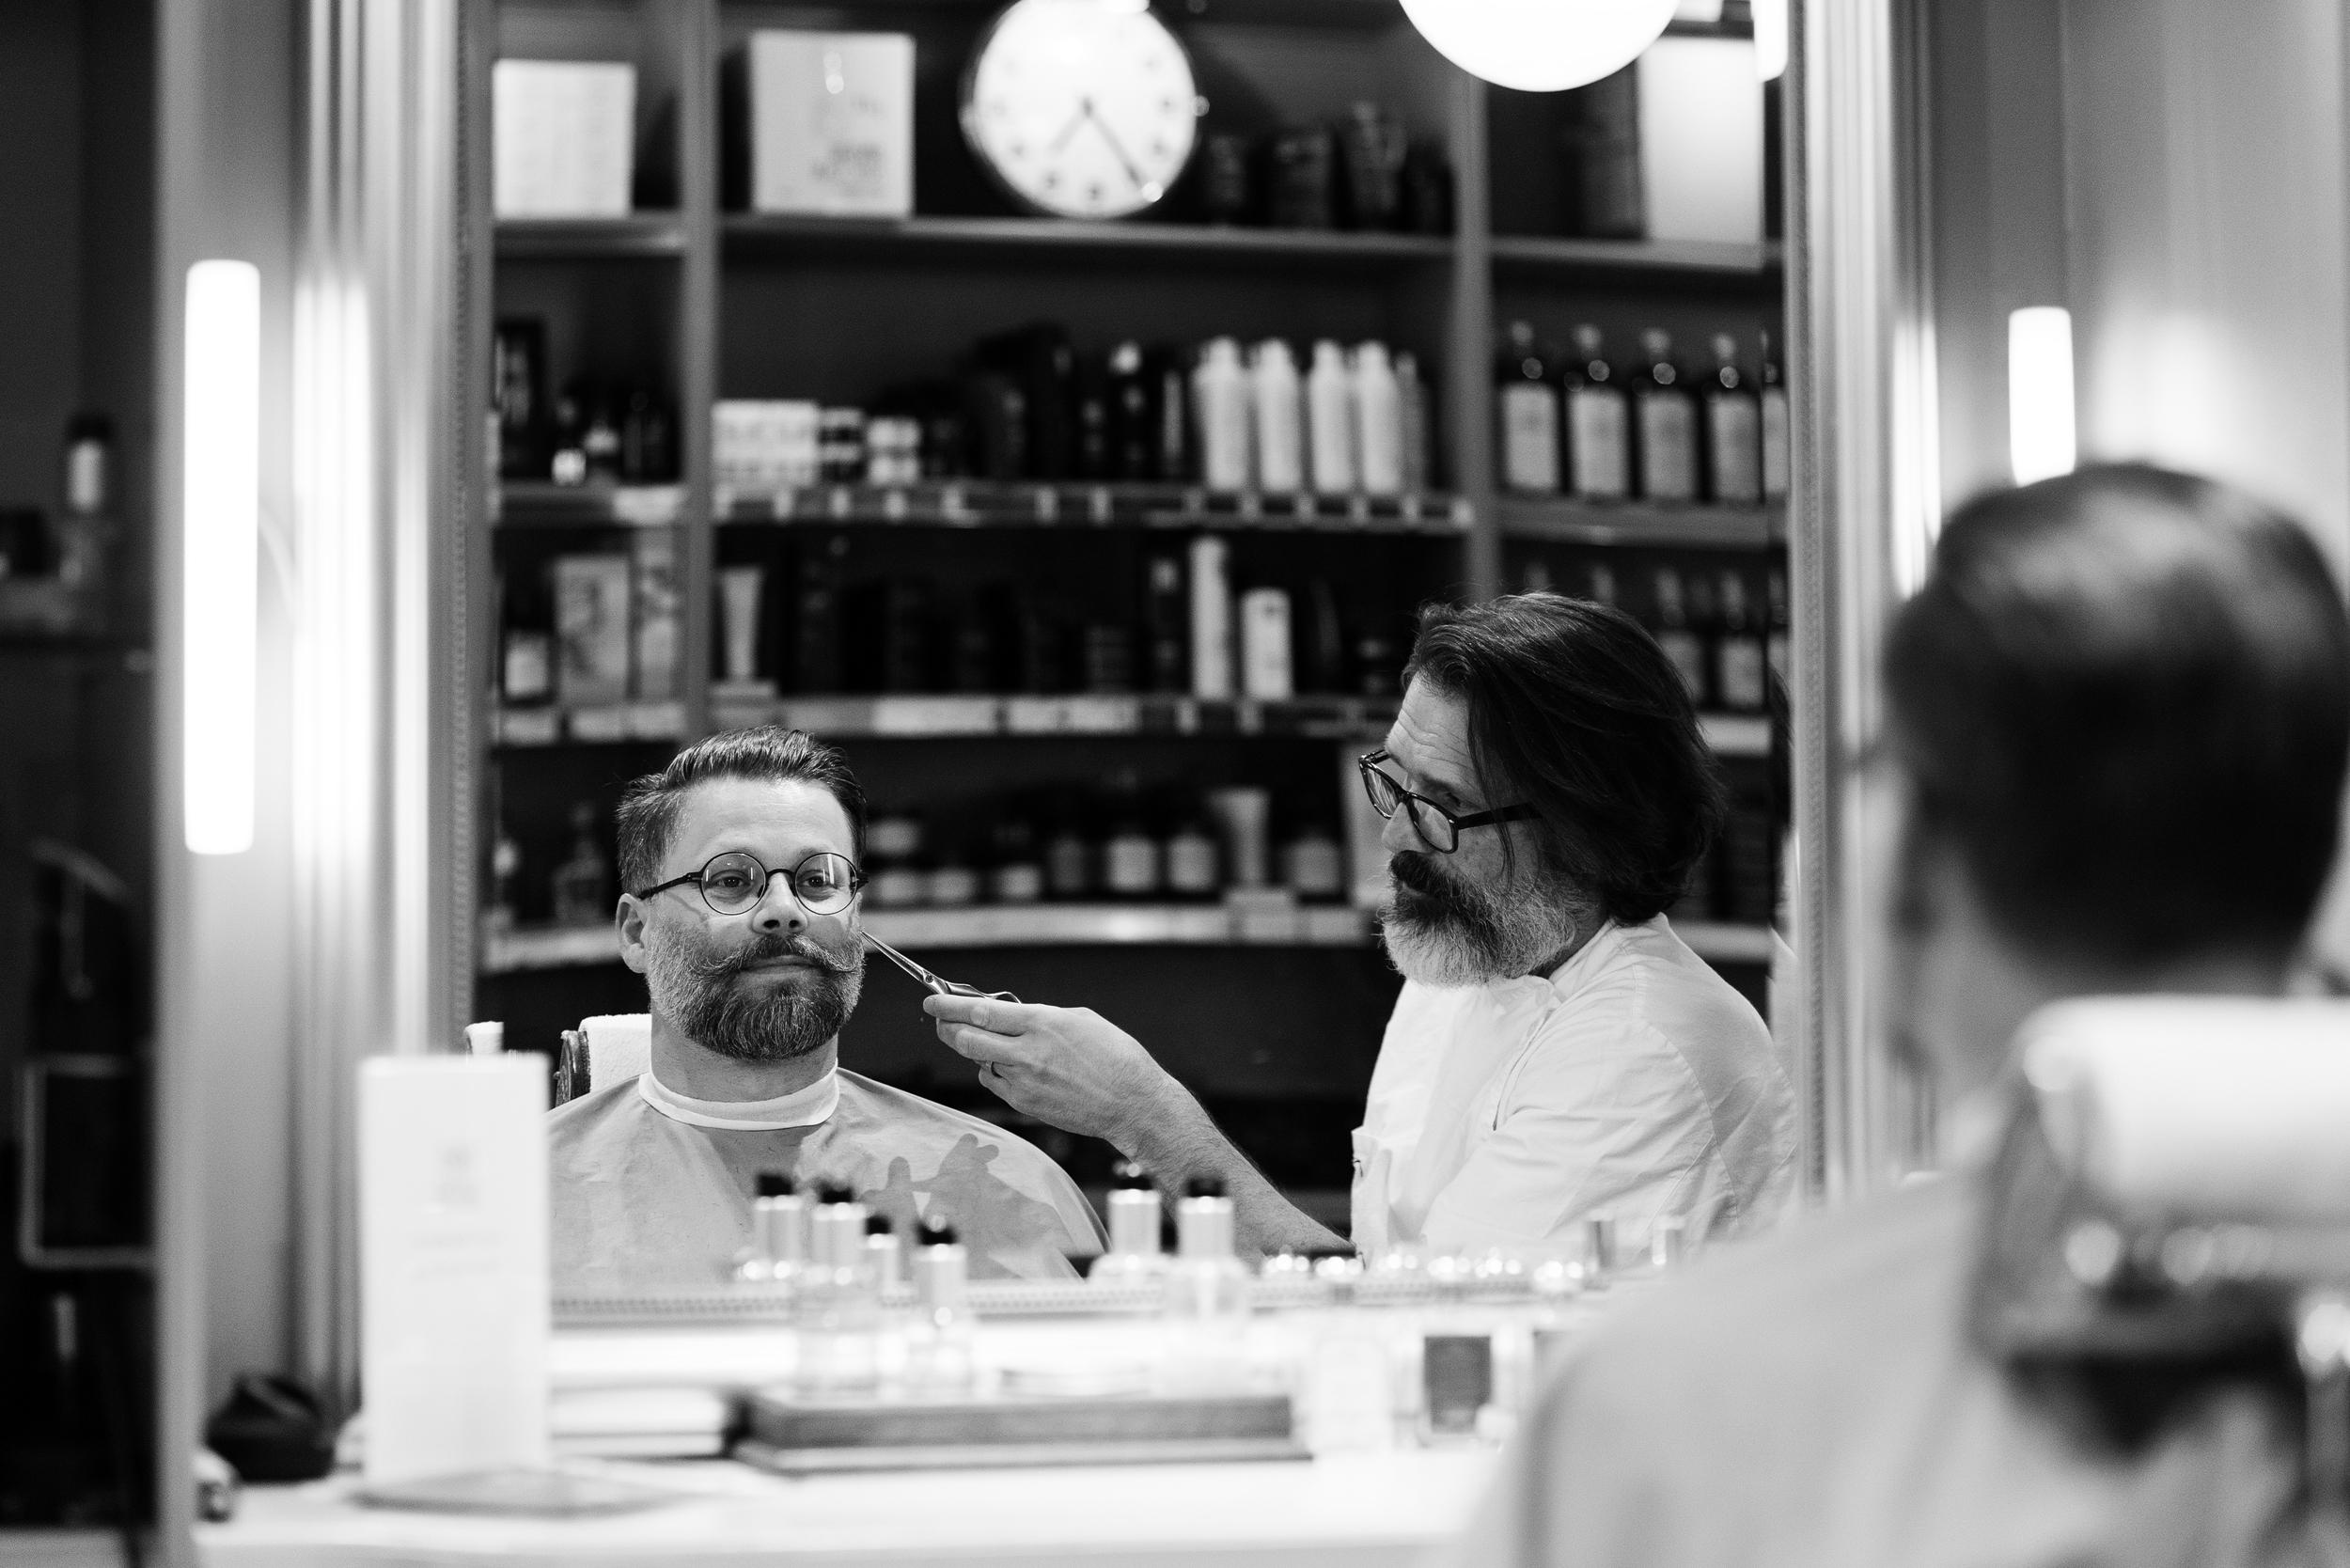 Barber&Books © Mr. Vagabond